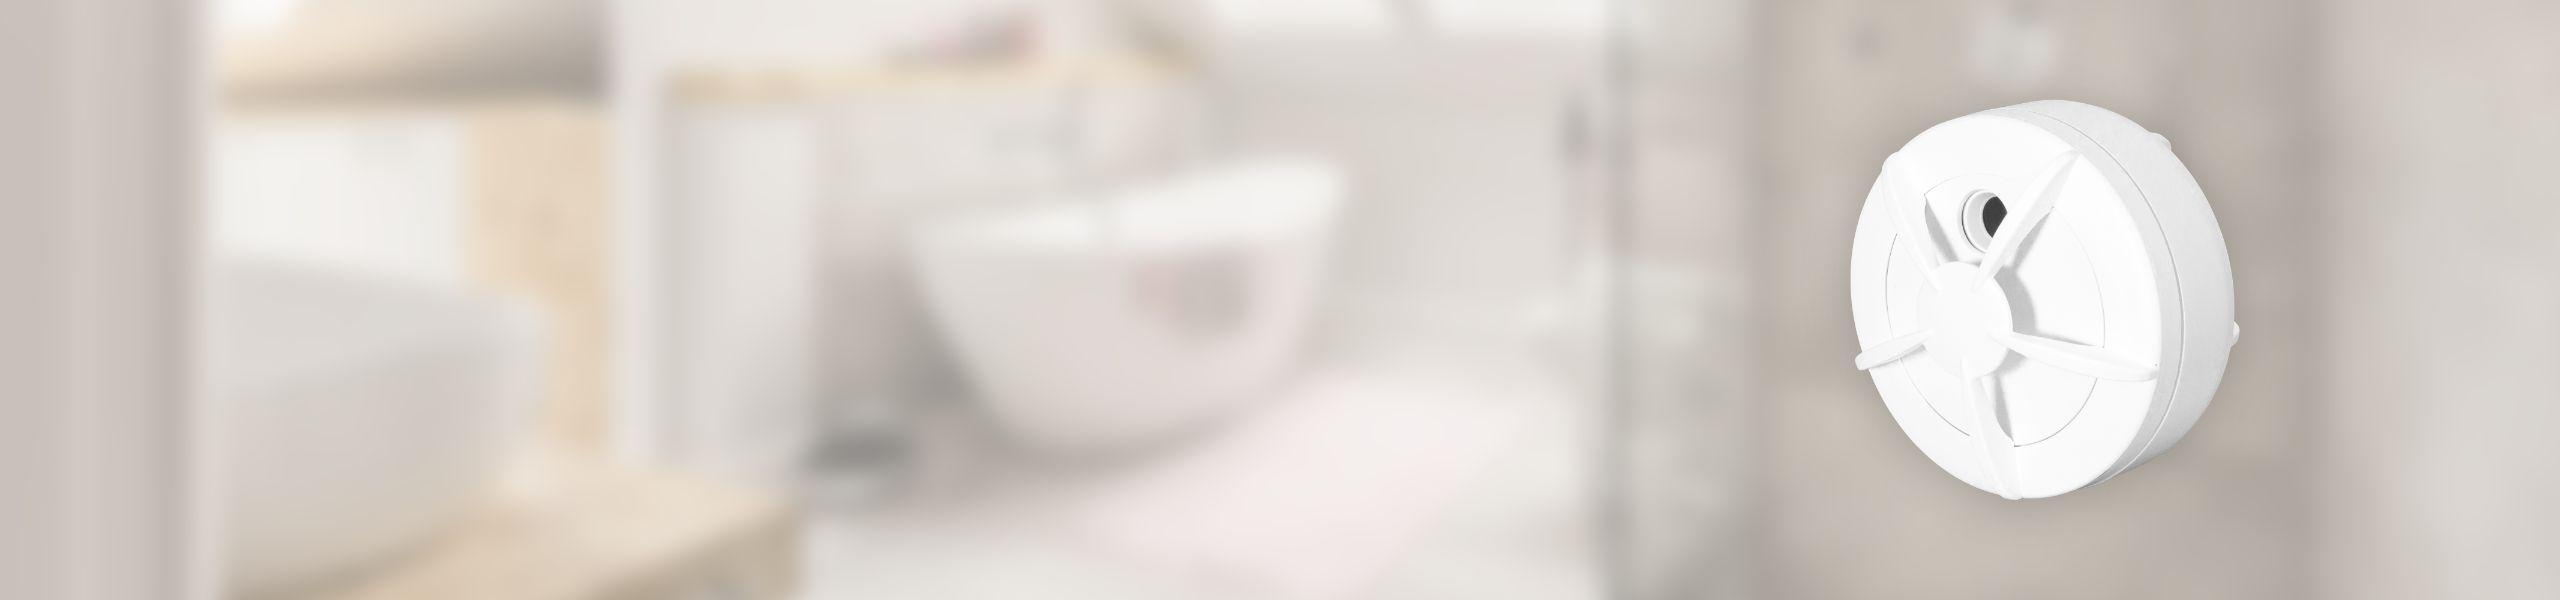 White water leak alarm sensor Nearsens with bathroom on the background